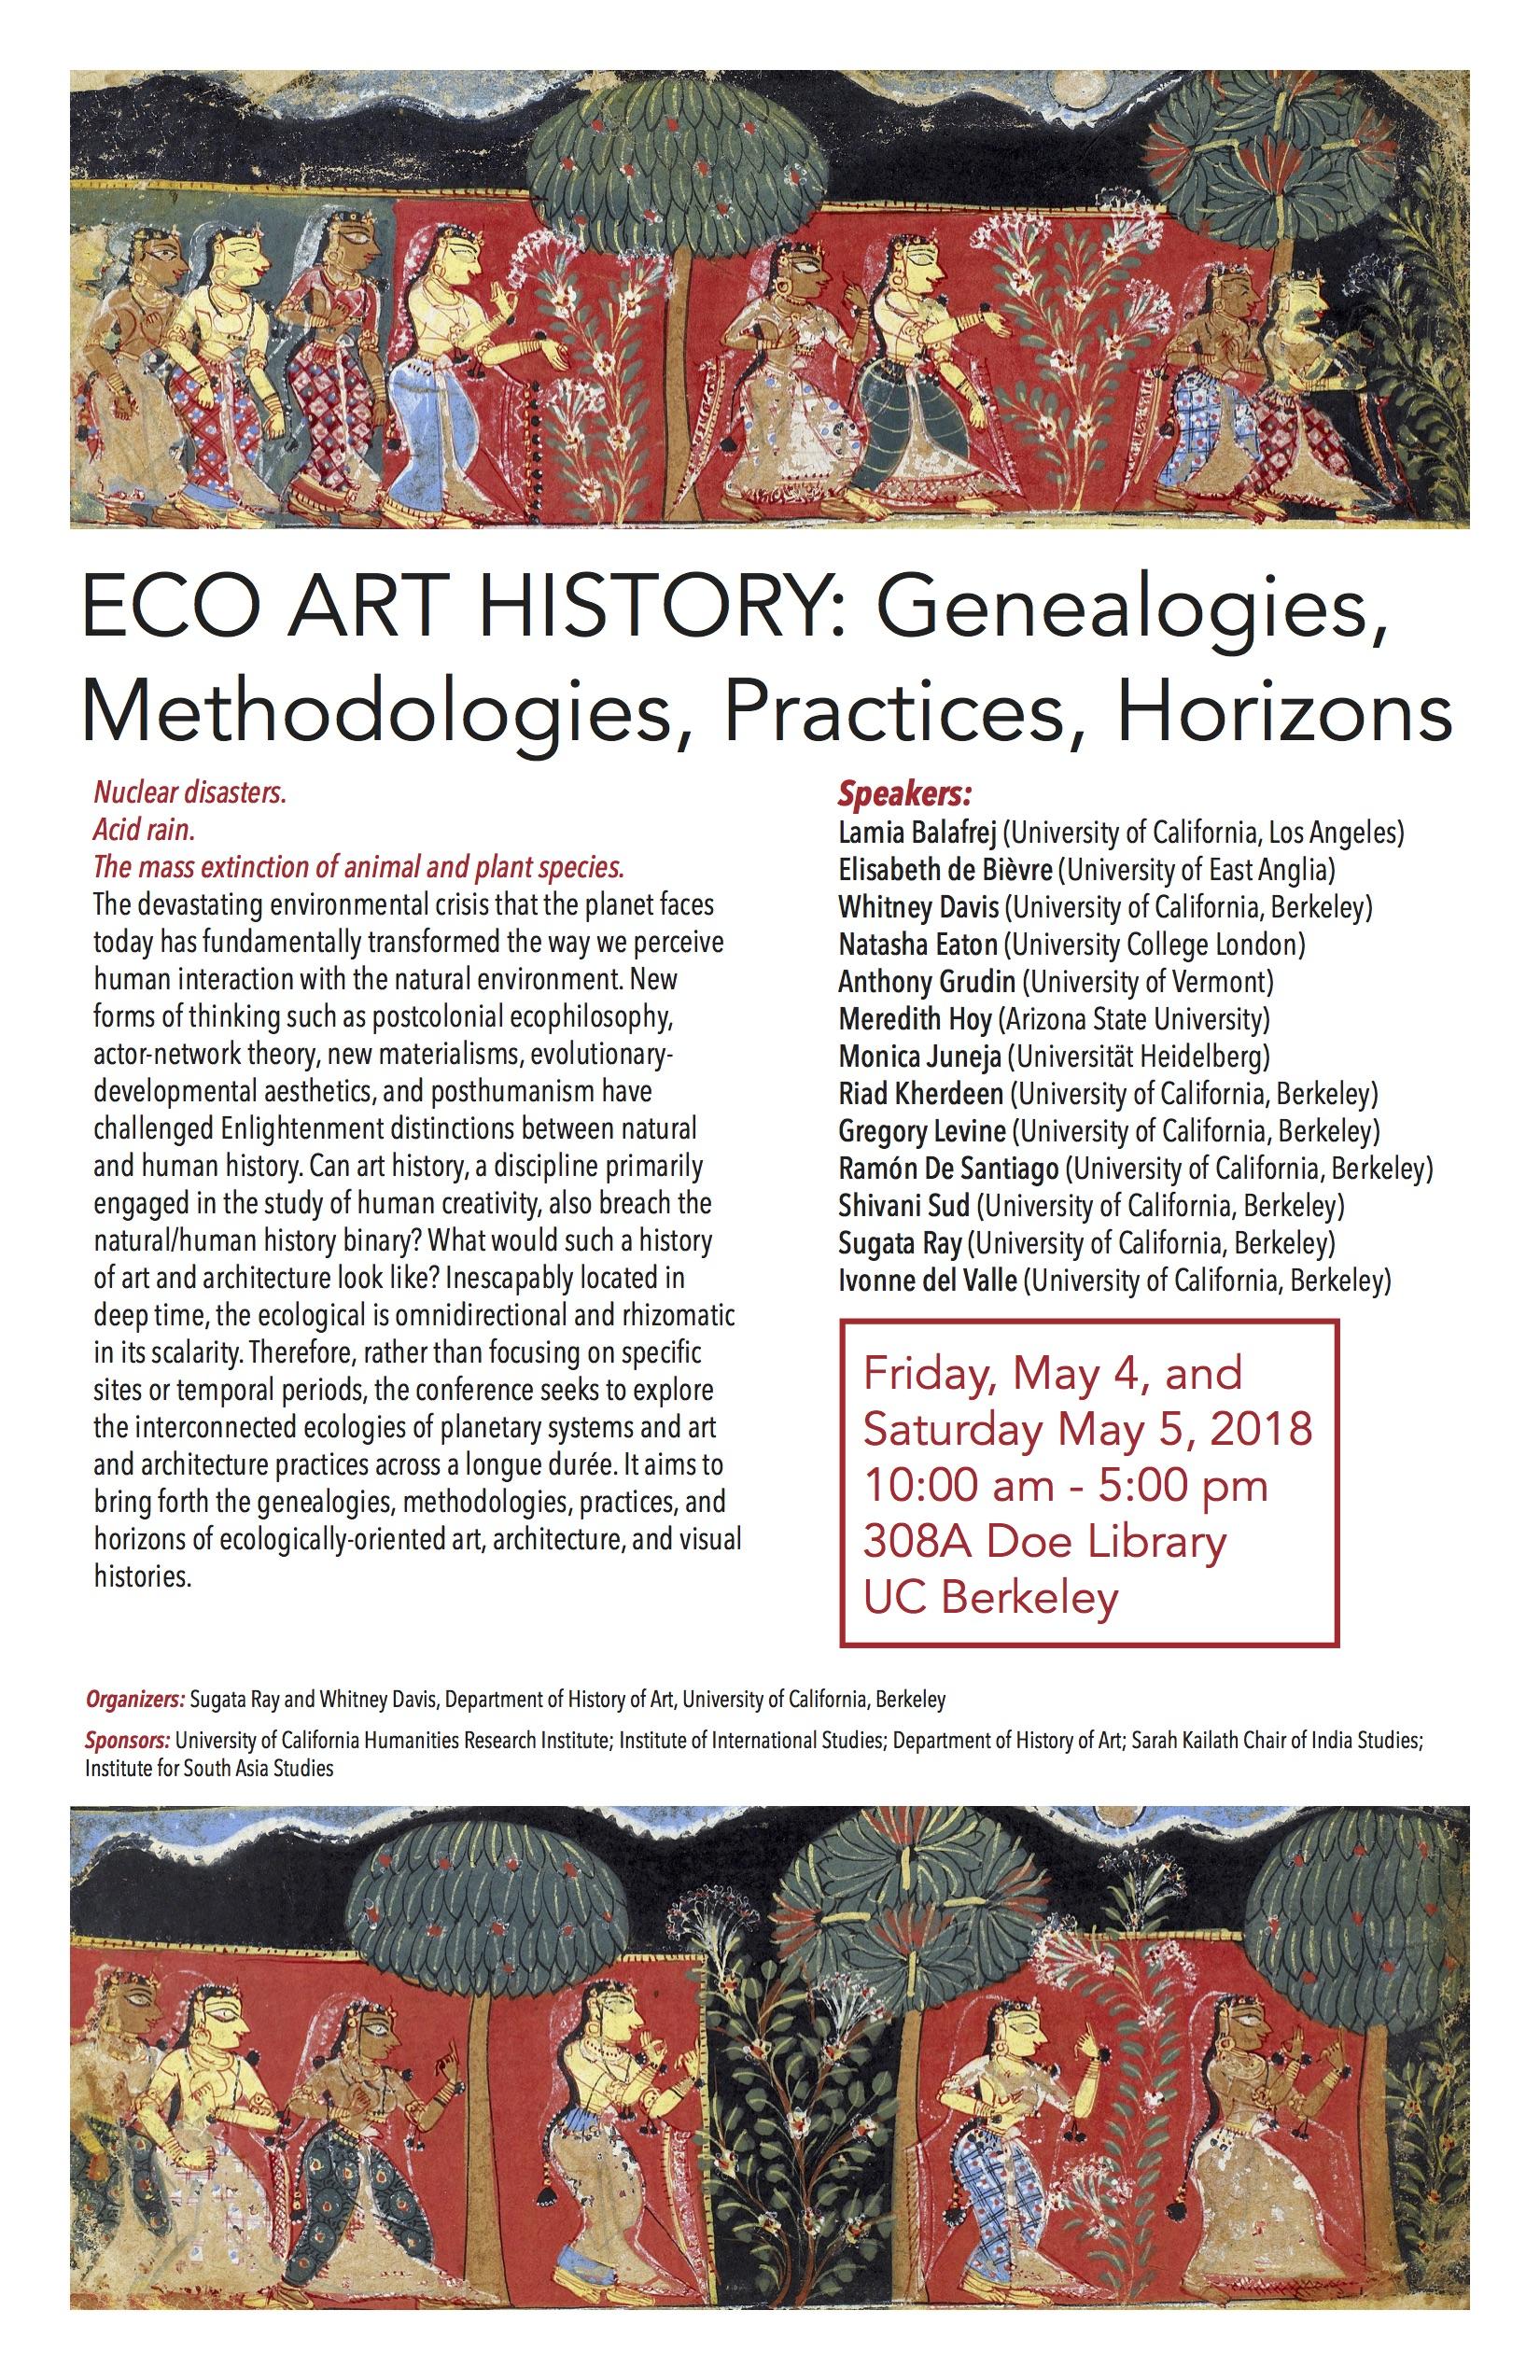 Eco Art History Conference 2018-2 copy.jpg